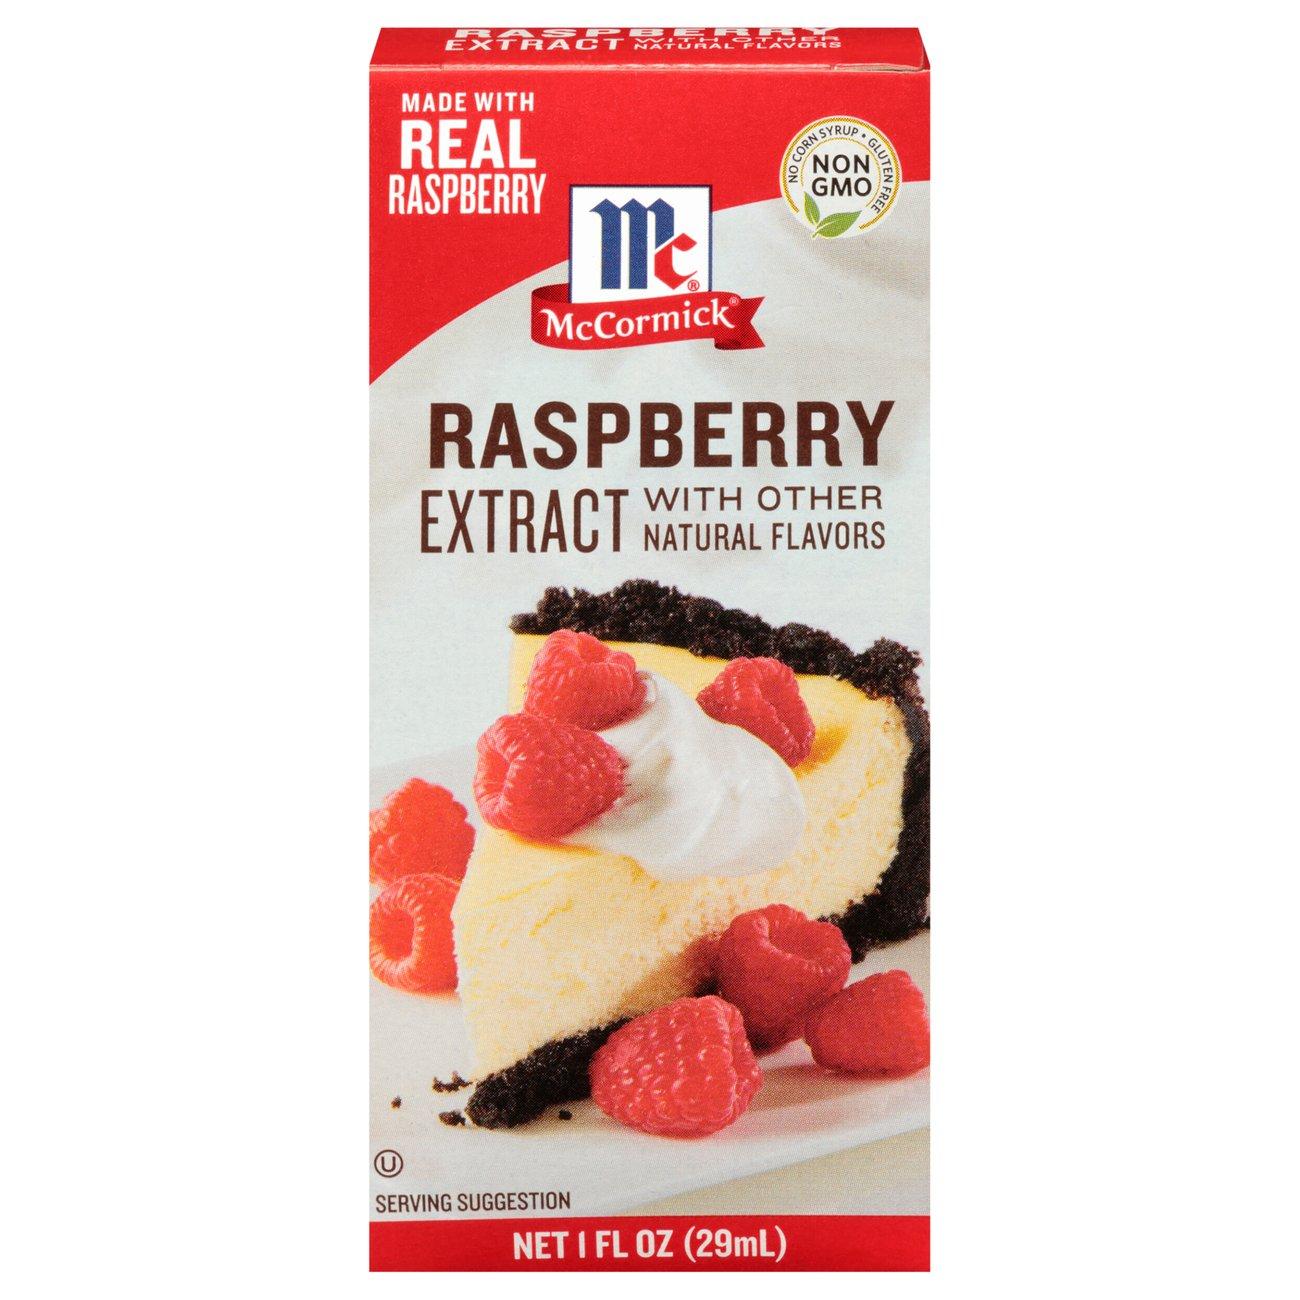 McCormick Raspberry Extract ‑ Shop